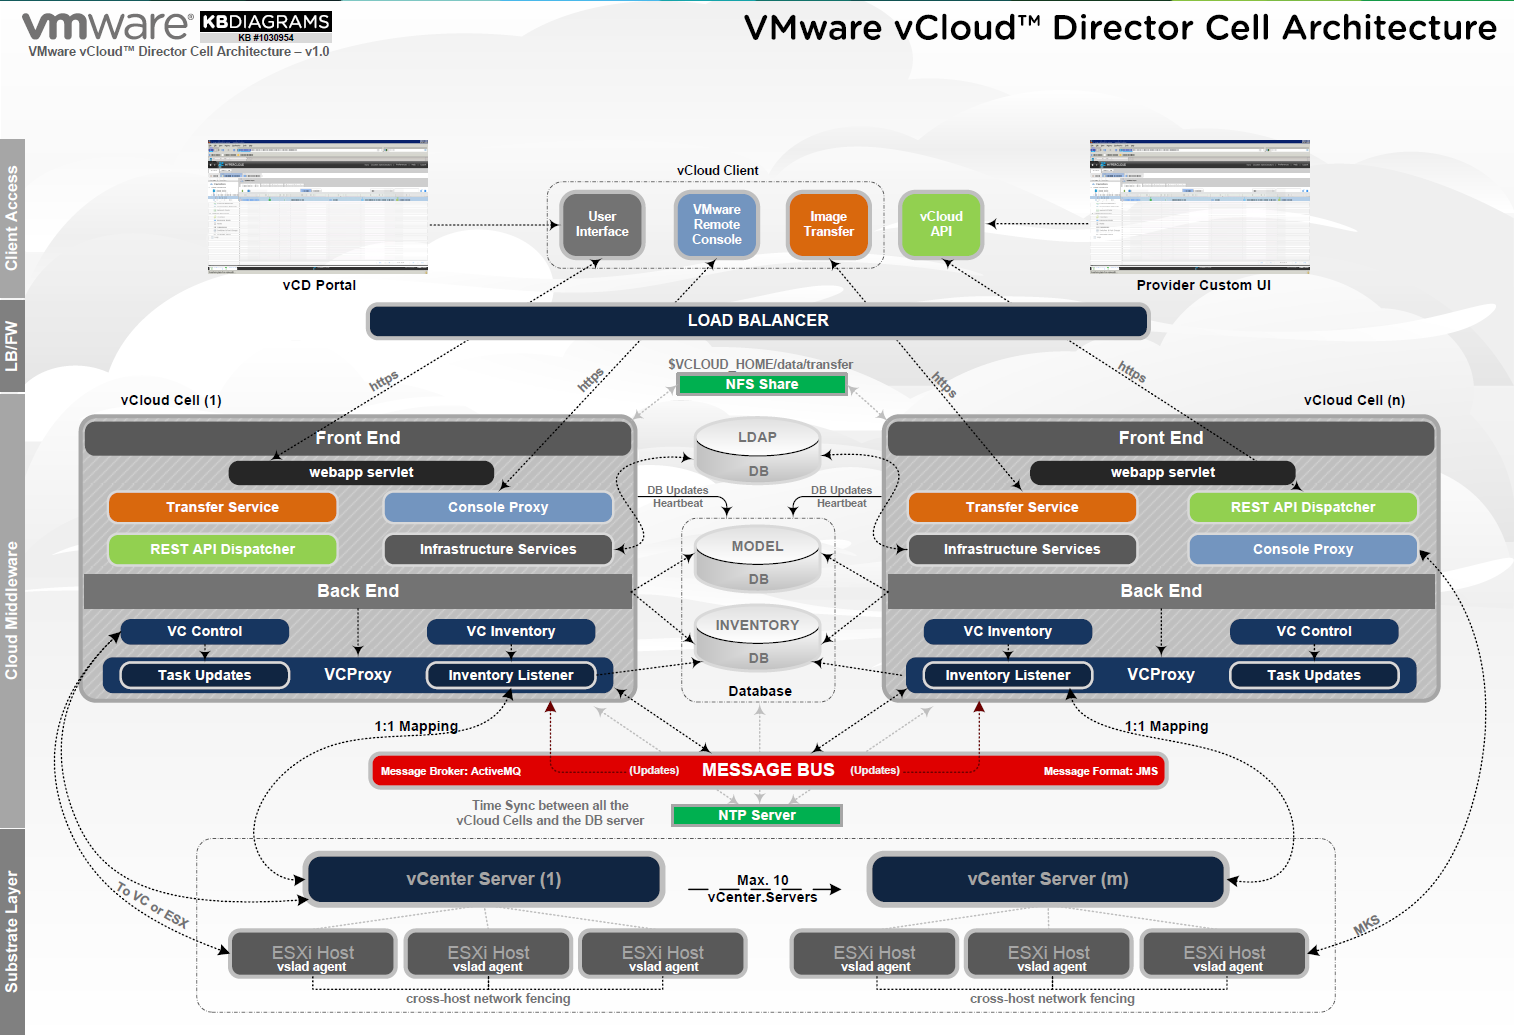 vmware virtual server diagram lighting software virtualpatel blogspot network ports diagrams